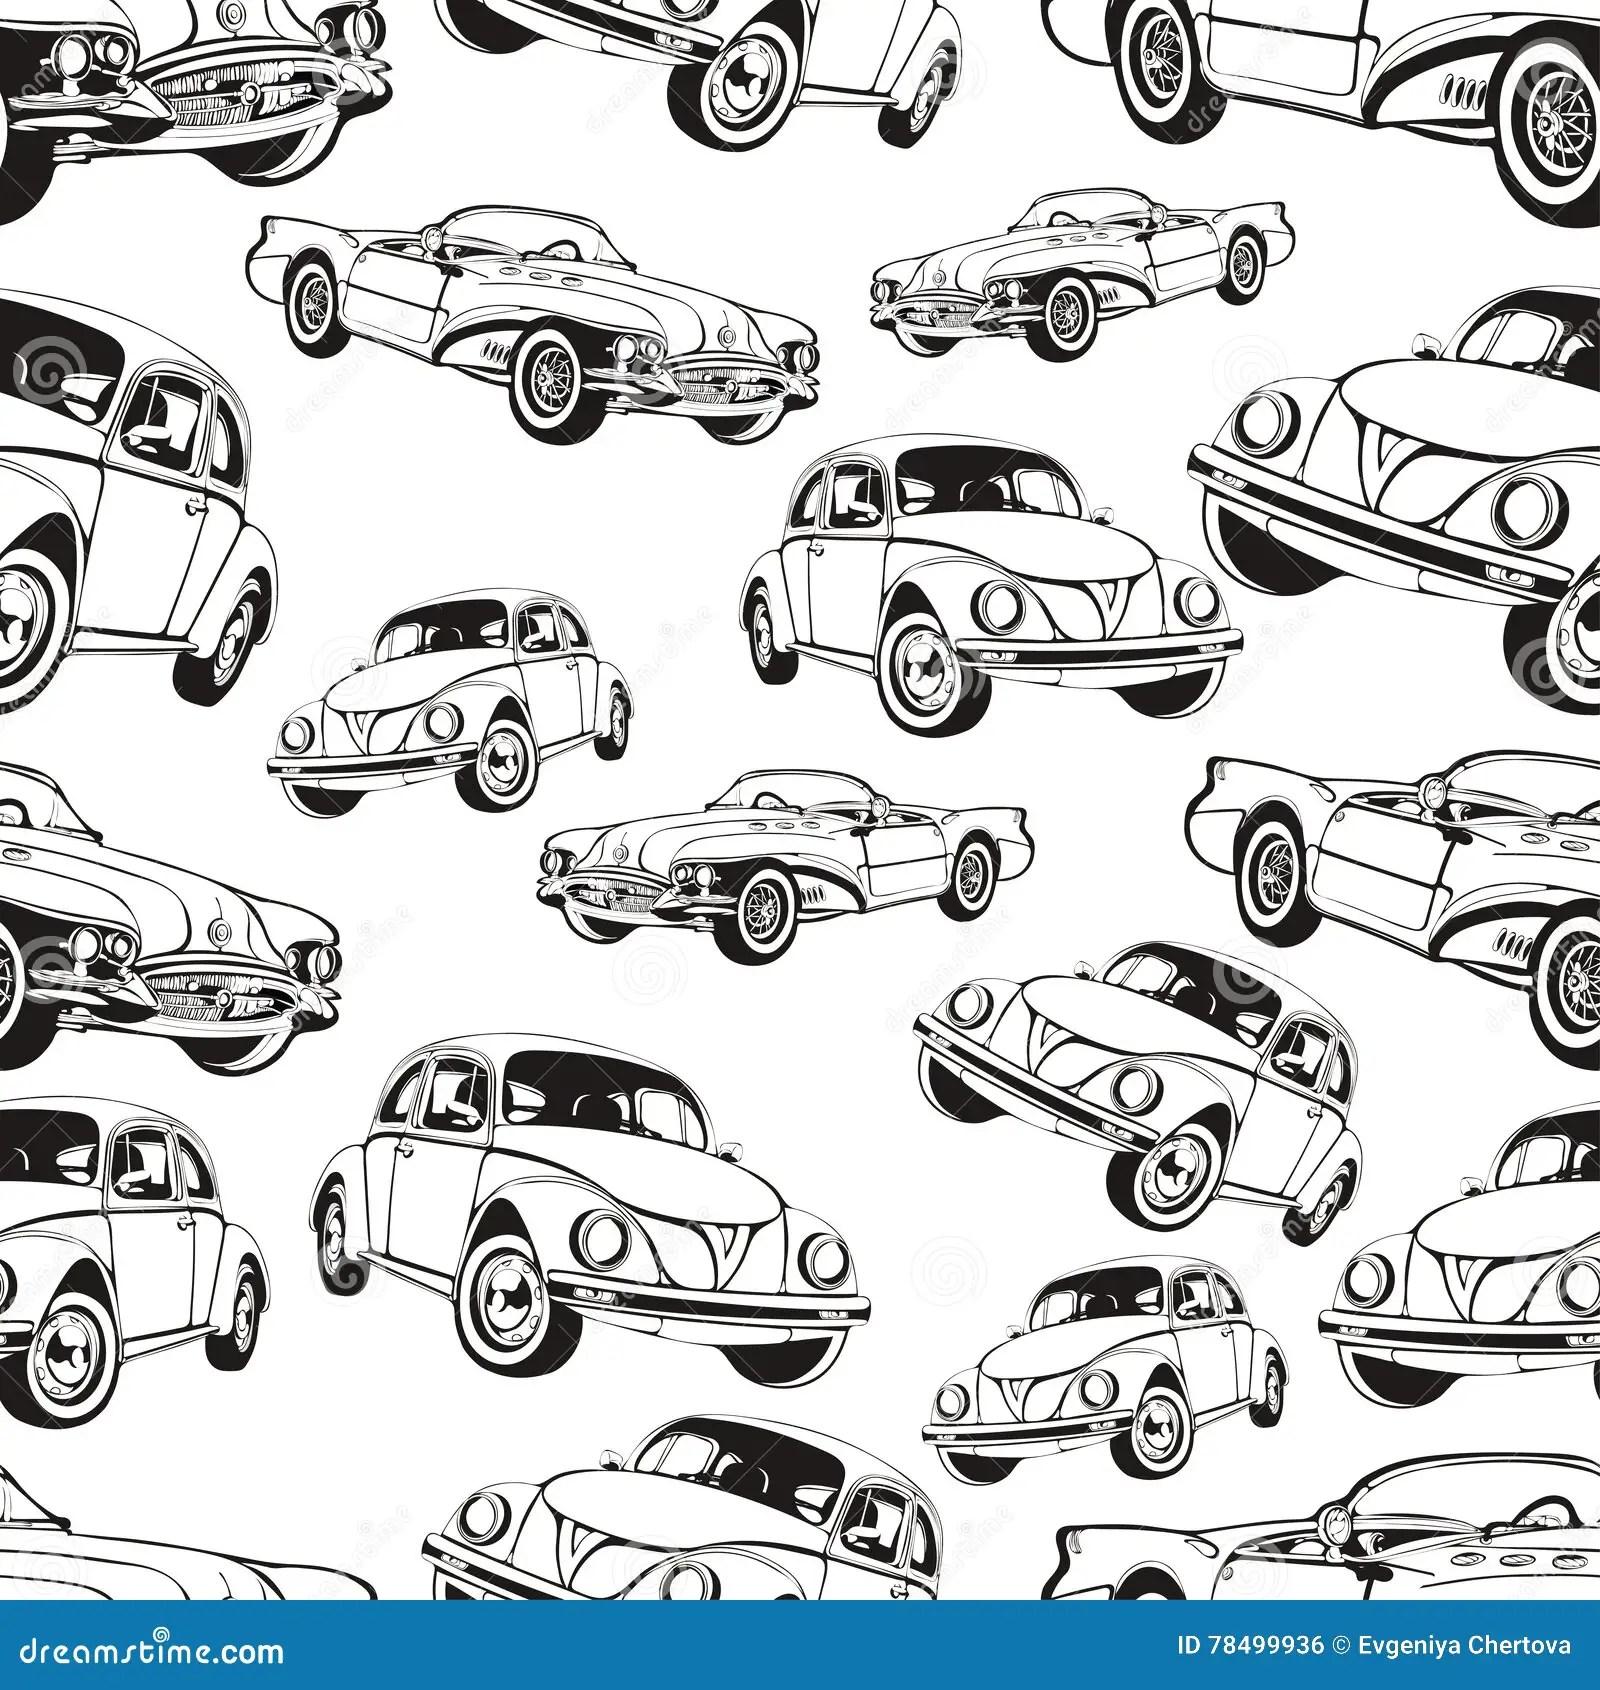 Vintage Car Seamless Pattern Black And White Retro